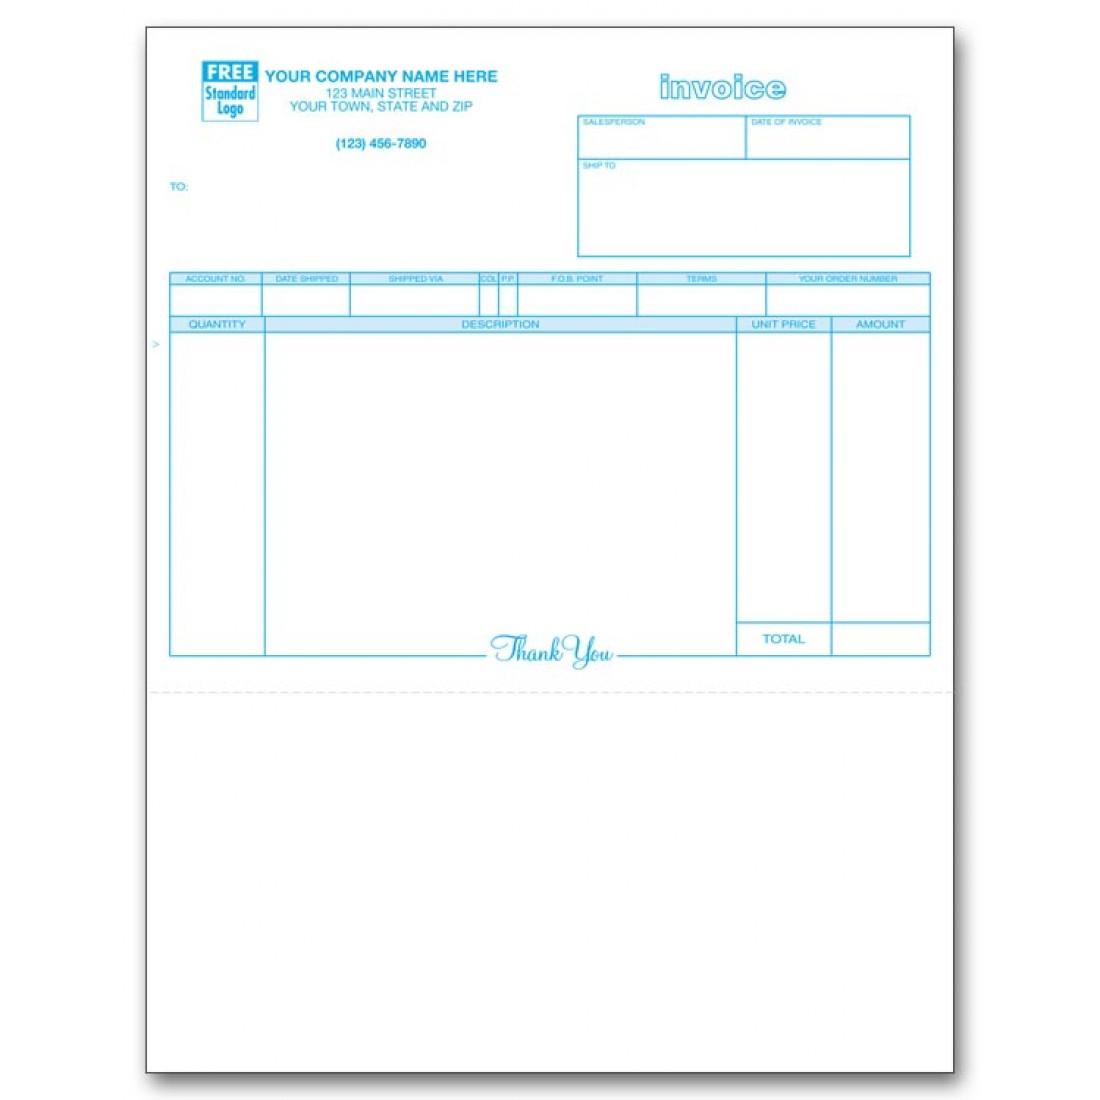 General Laser Invoice, 3-Part